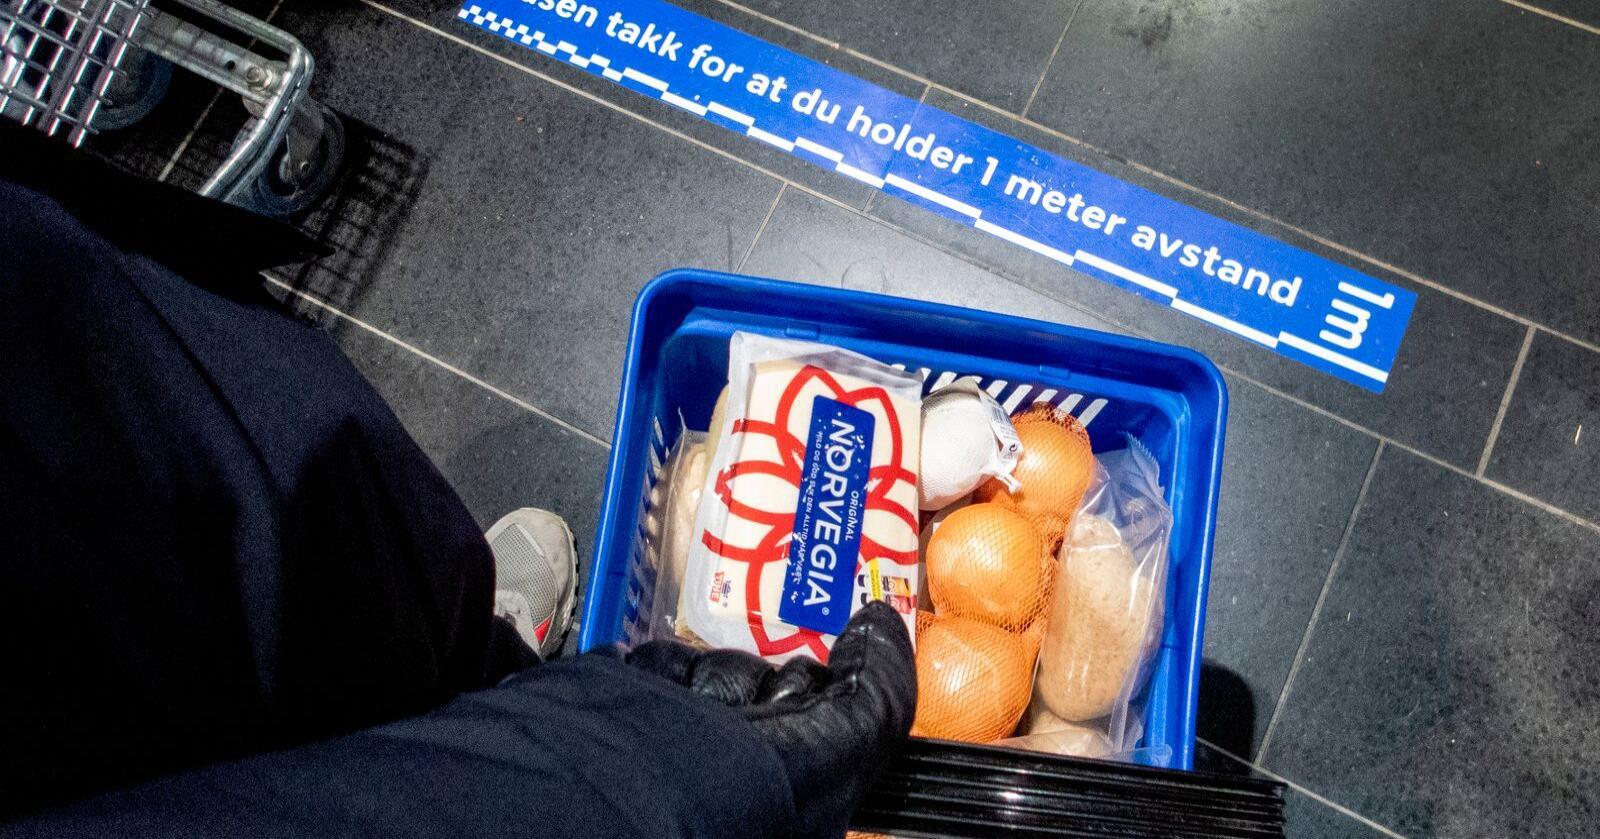 Flere nordmenn enn tidligere tror deres valg av matvarer har betydning. Foto: Gorm Kallestad / NTB scanpix